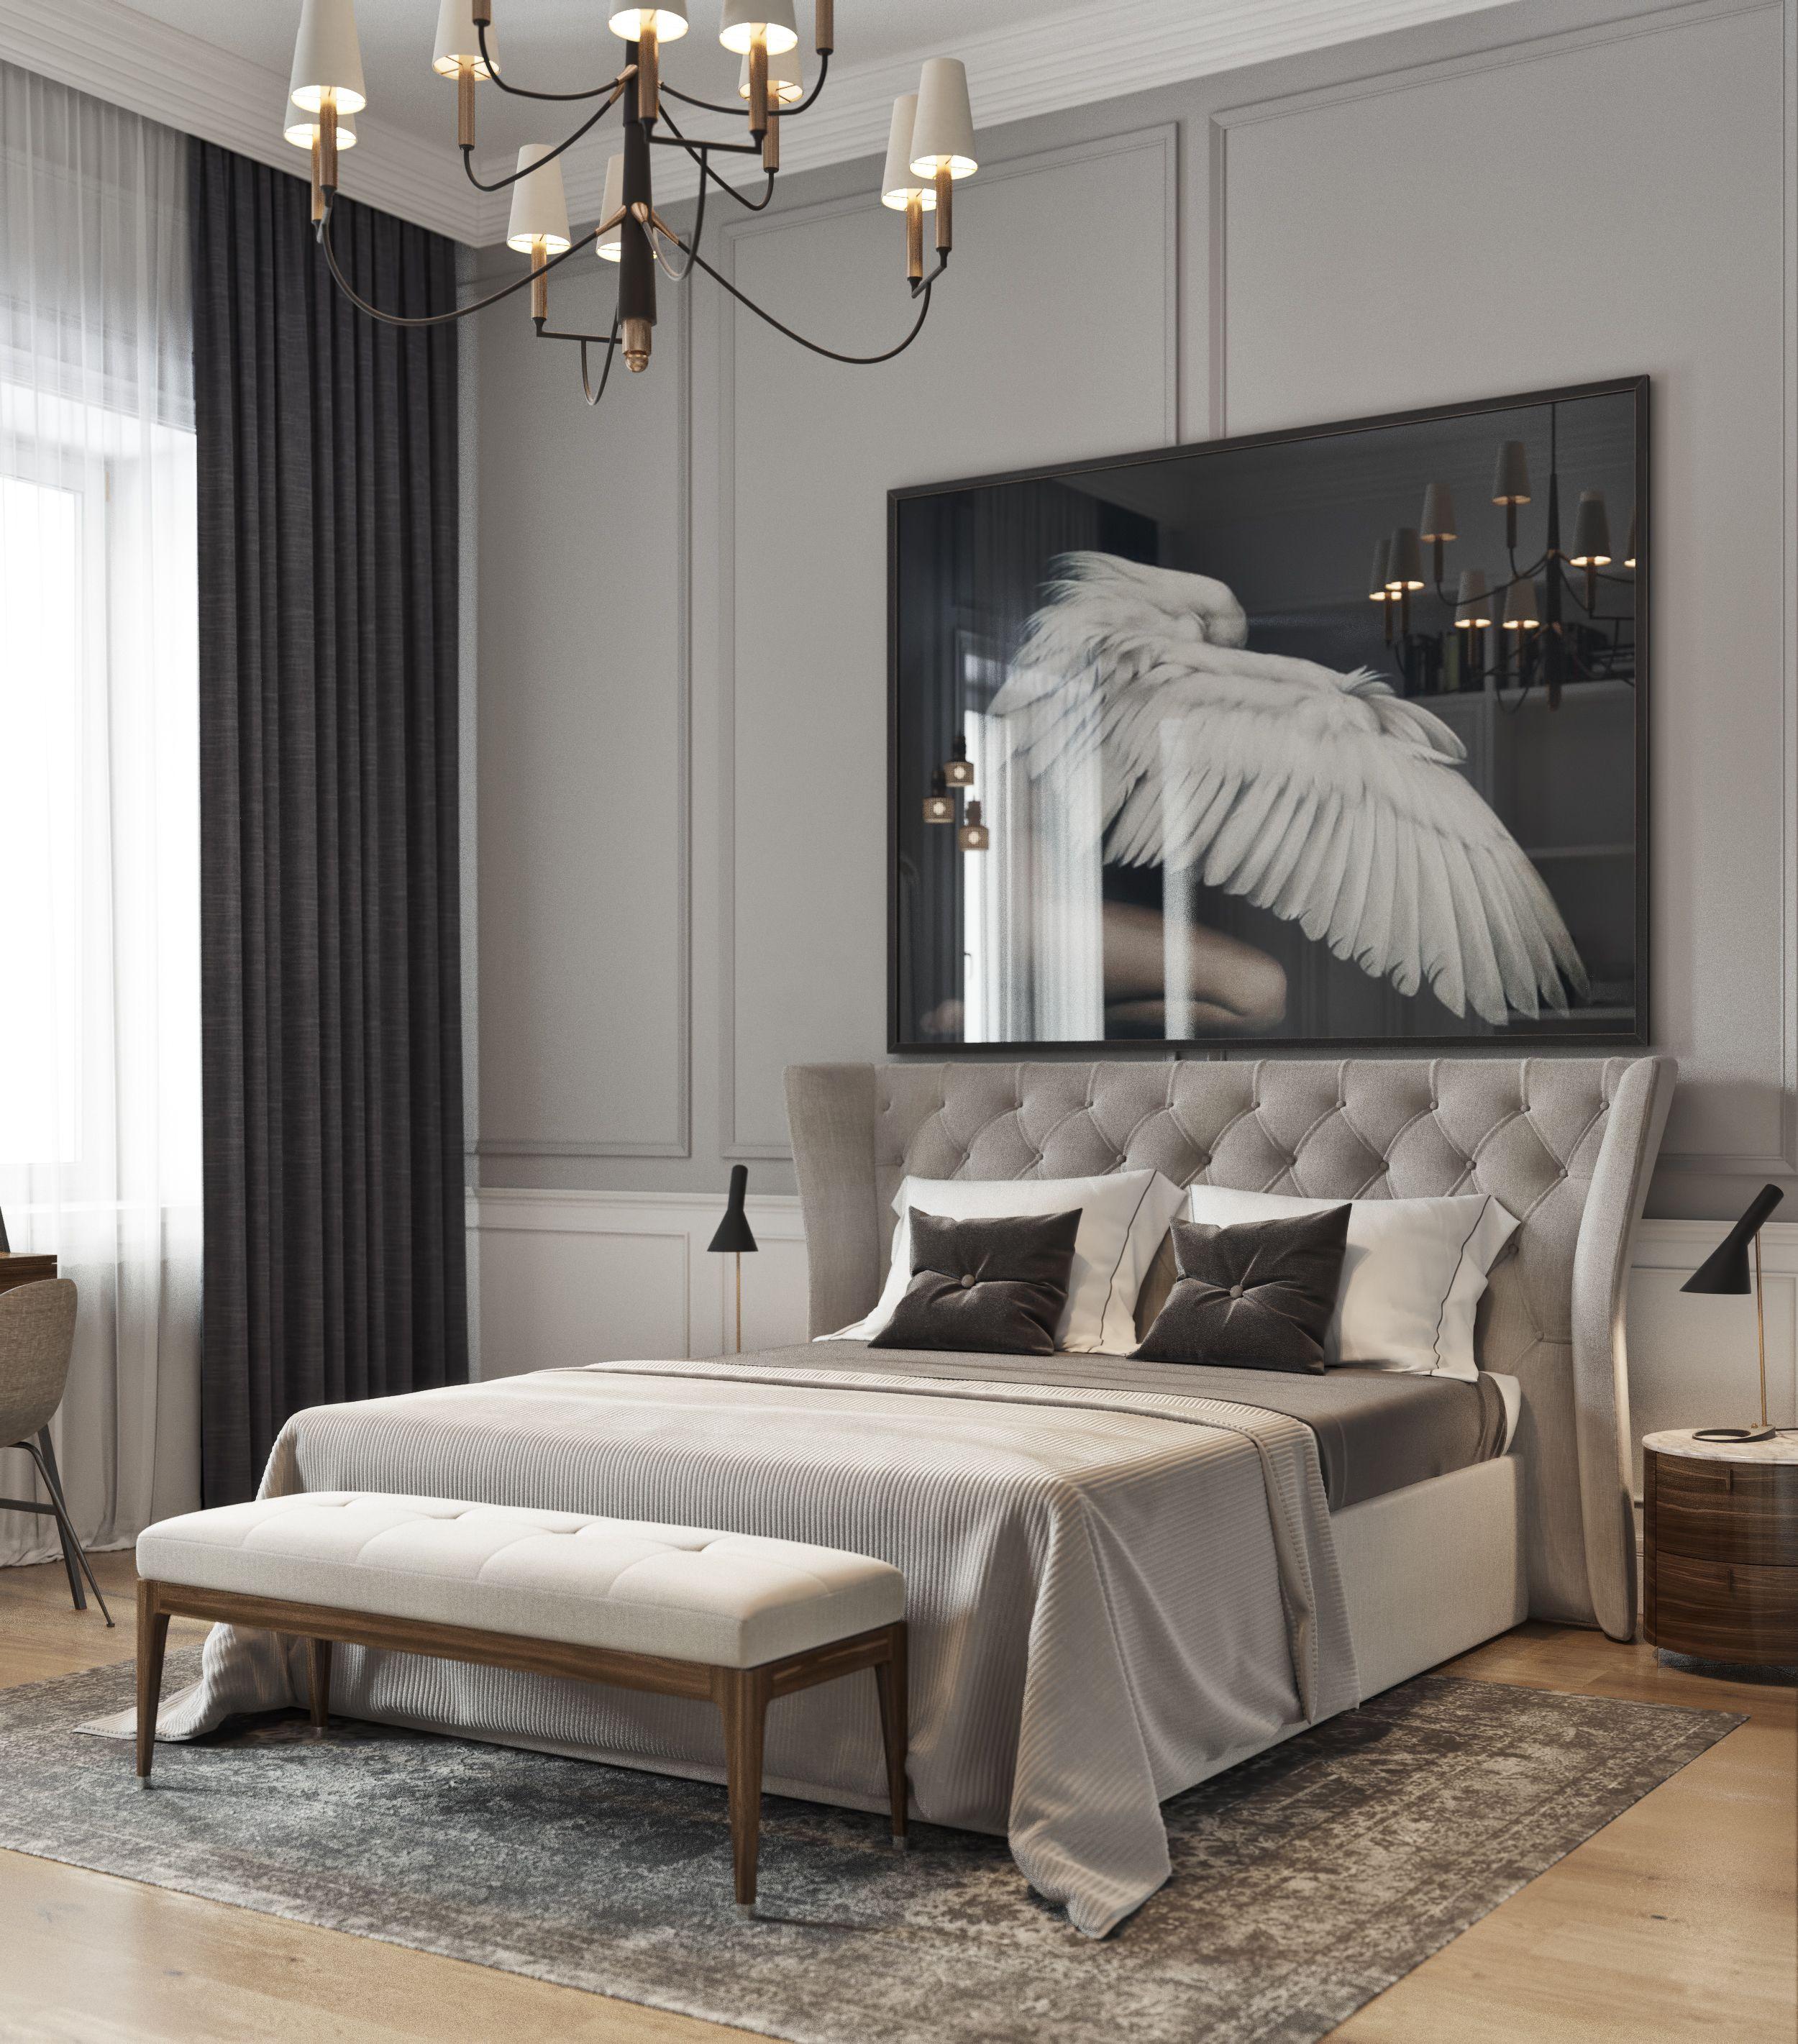 3ds Max 2016 Corona Renderer Photoshop Cc Luxurious Bedrooms